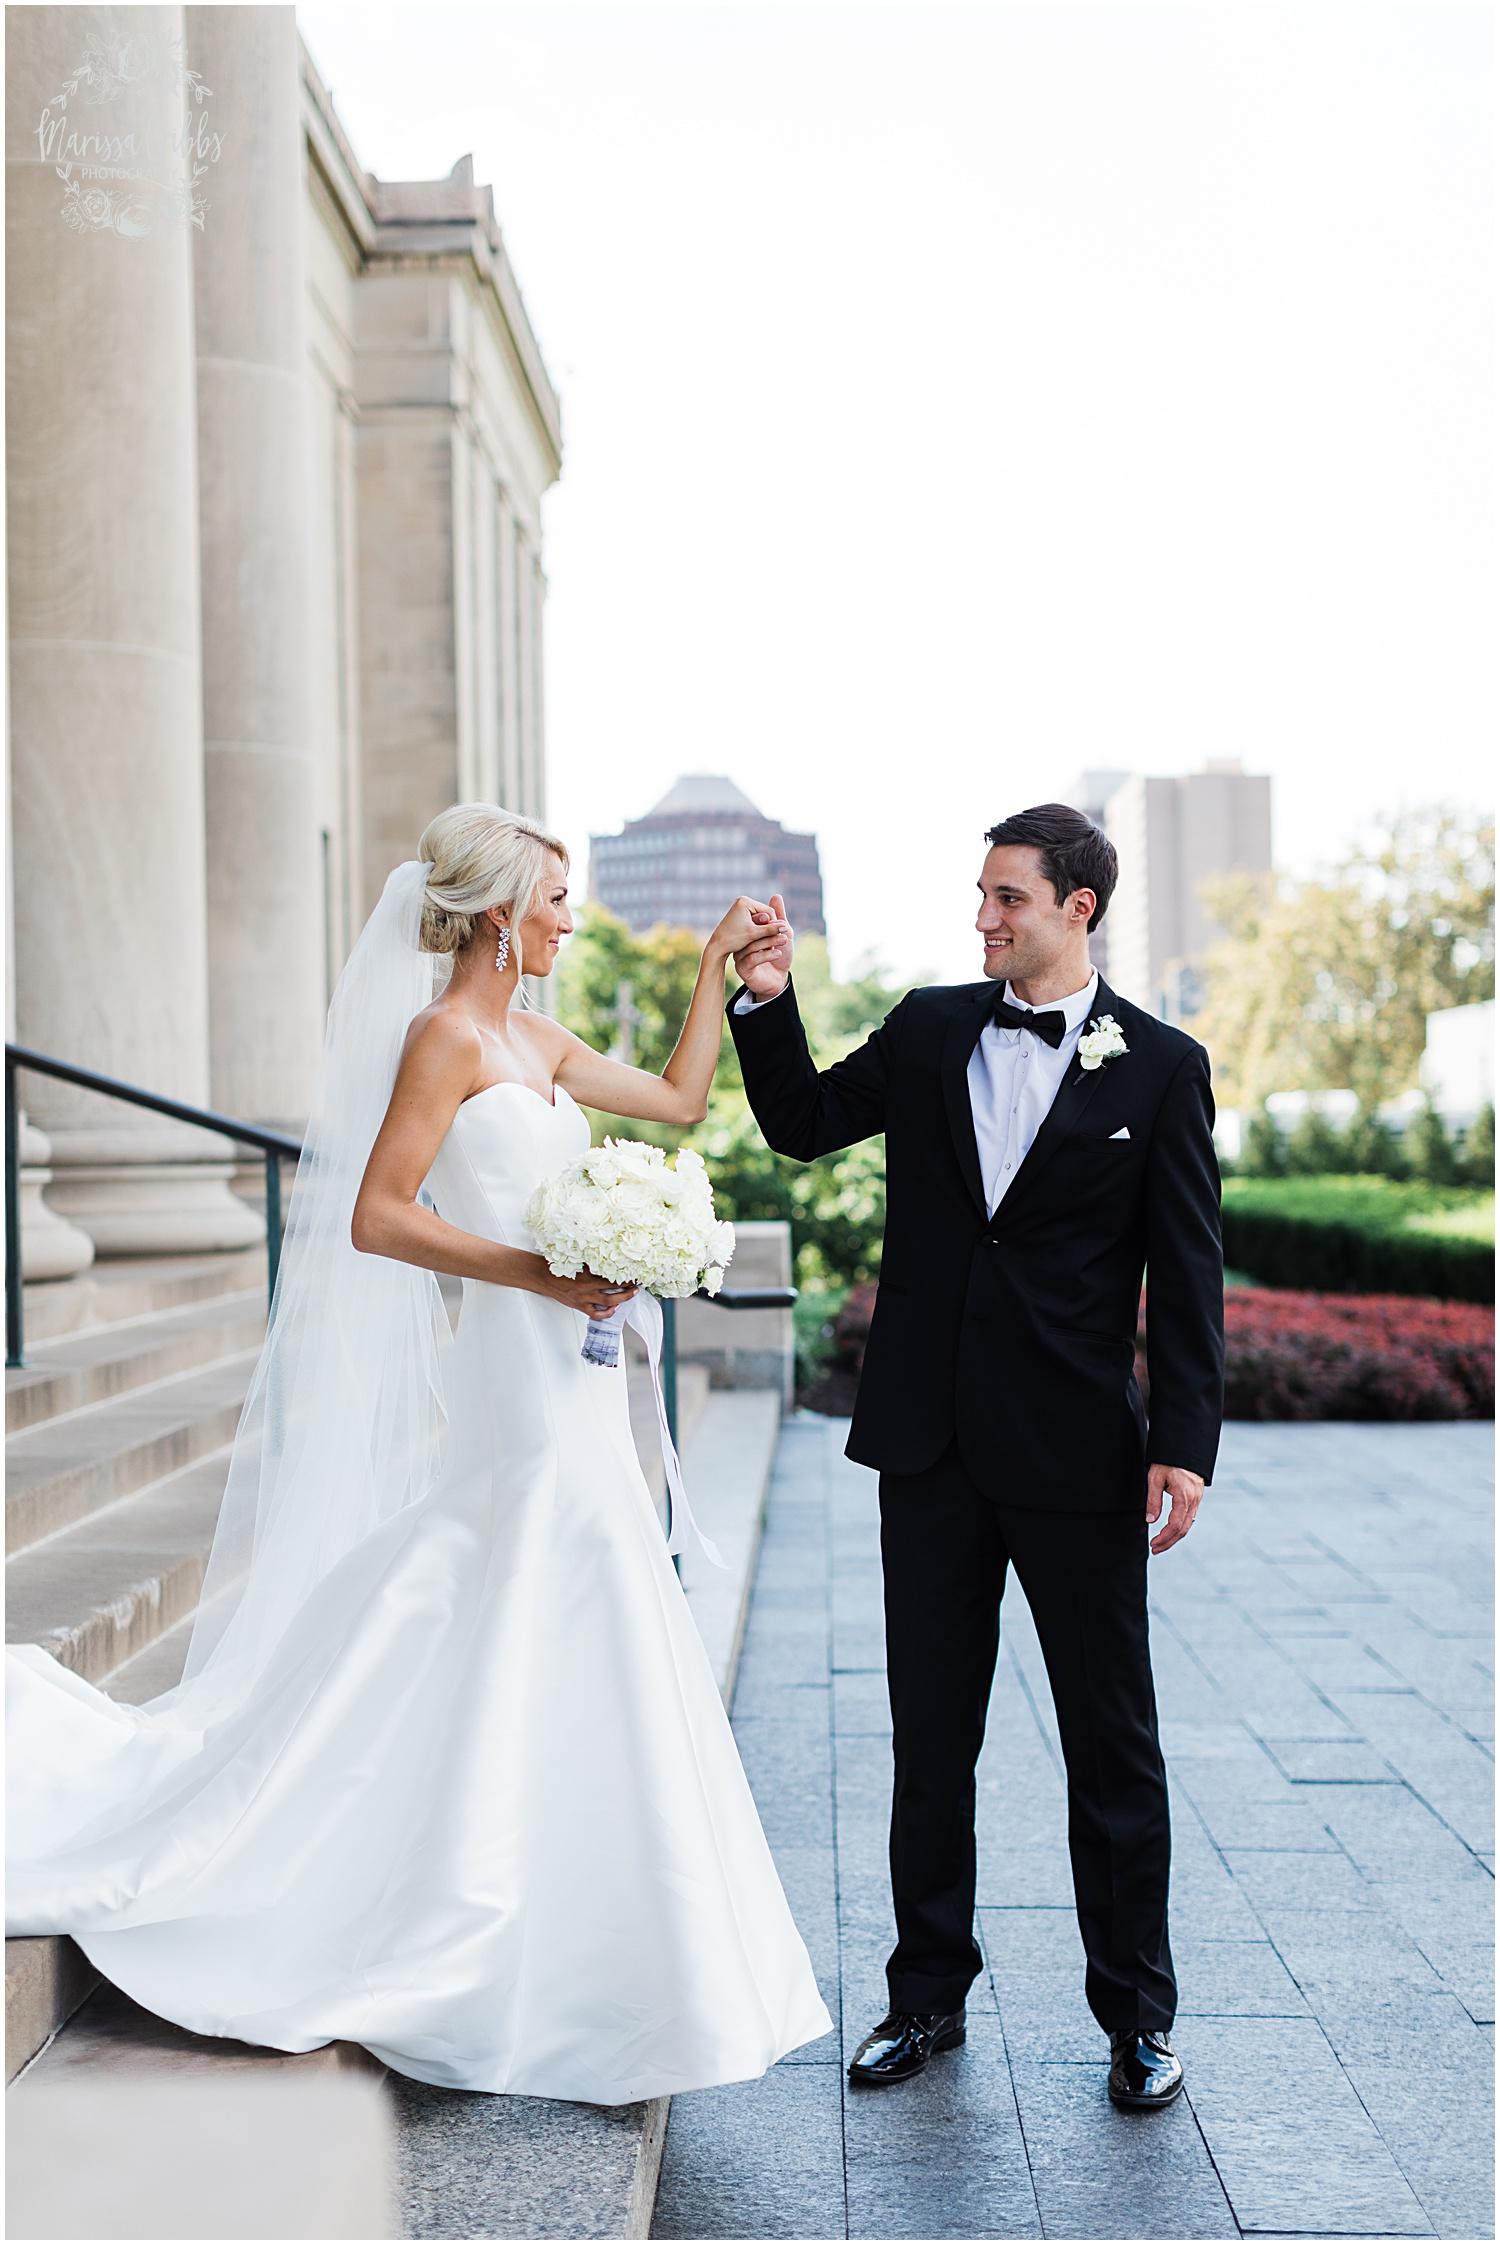 NOLL WEDDING | THE BRASS ON BALTIMORE | MARISSA CRIBBS PHOTOGRAPHY_6329.jpg